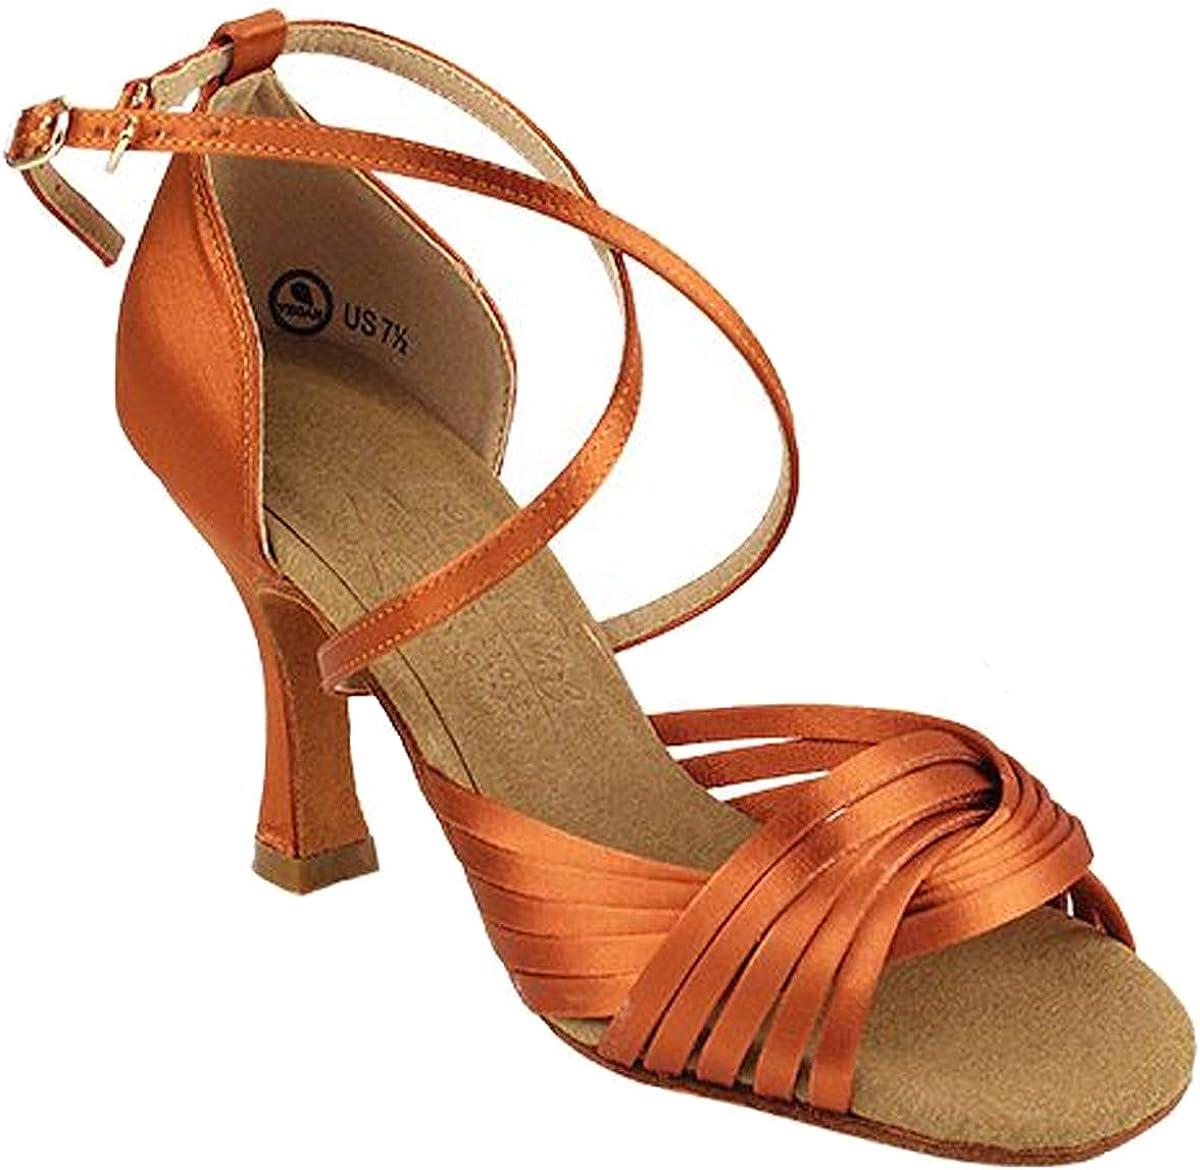 Women's Ballroom Dance Shoes Tango Wedding Salsa Dance Shoes Dark Tan Satin S1001EB Comfortable - Very Fine 3